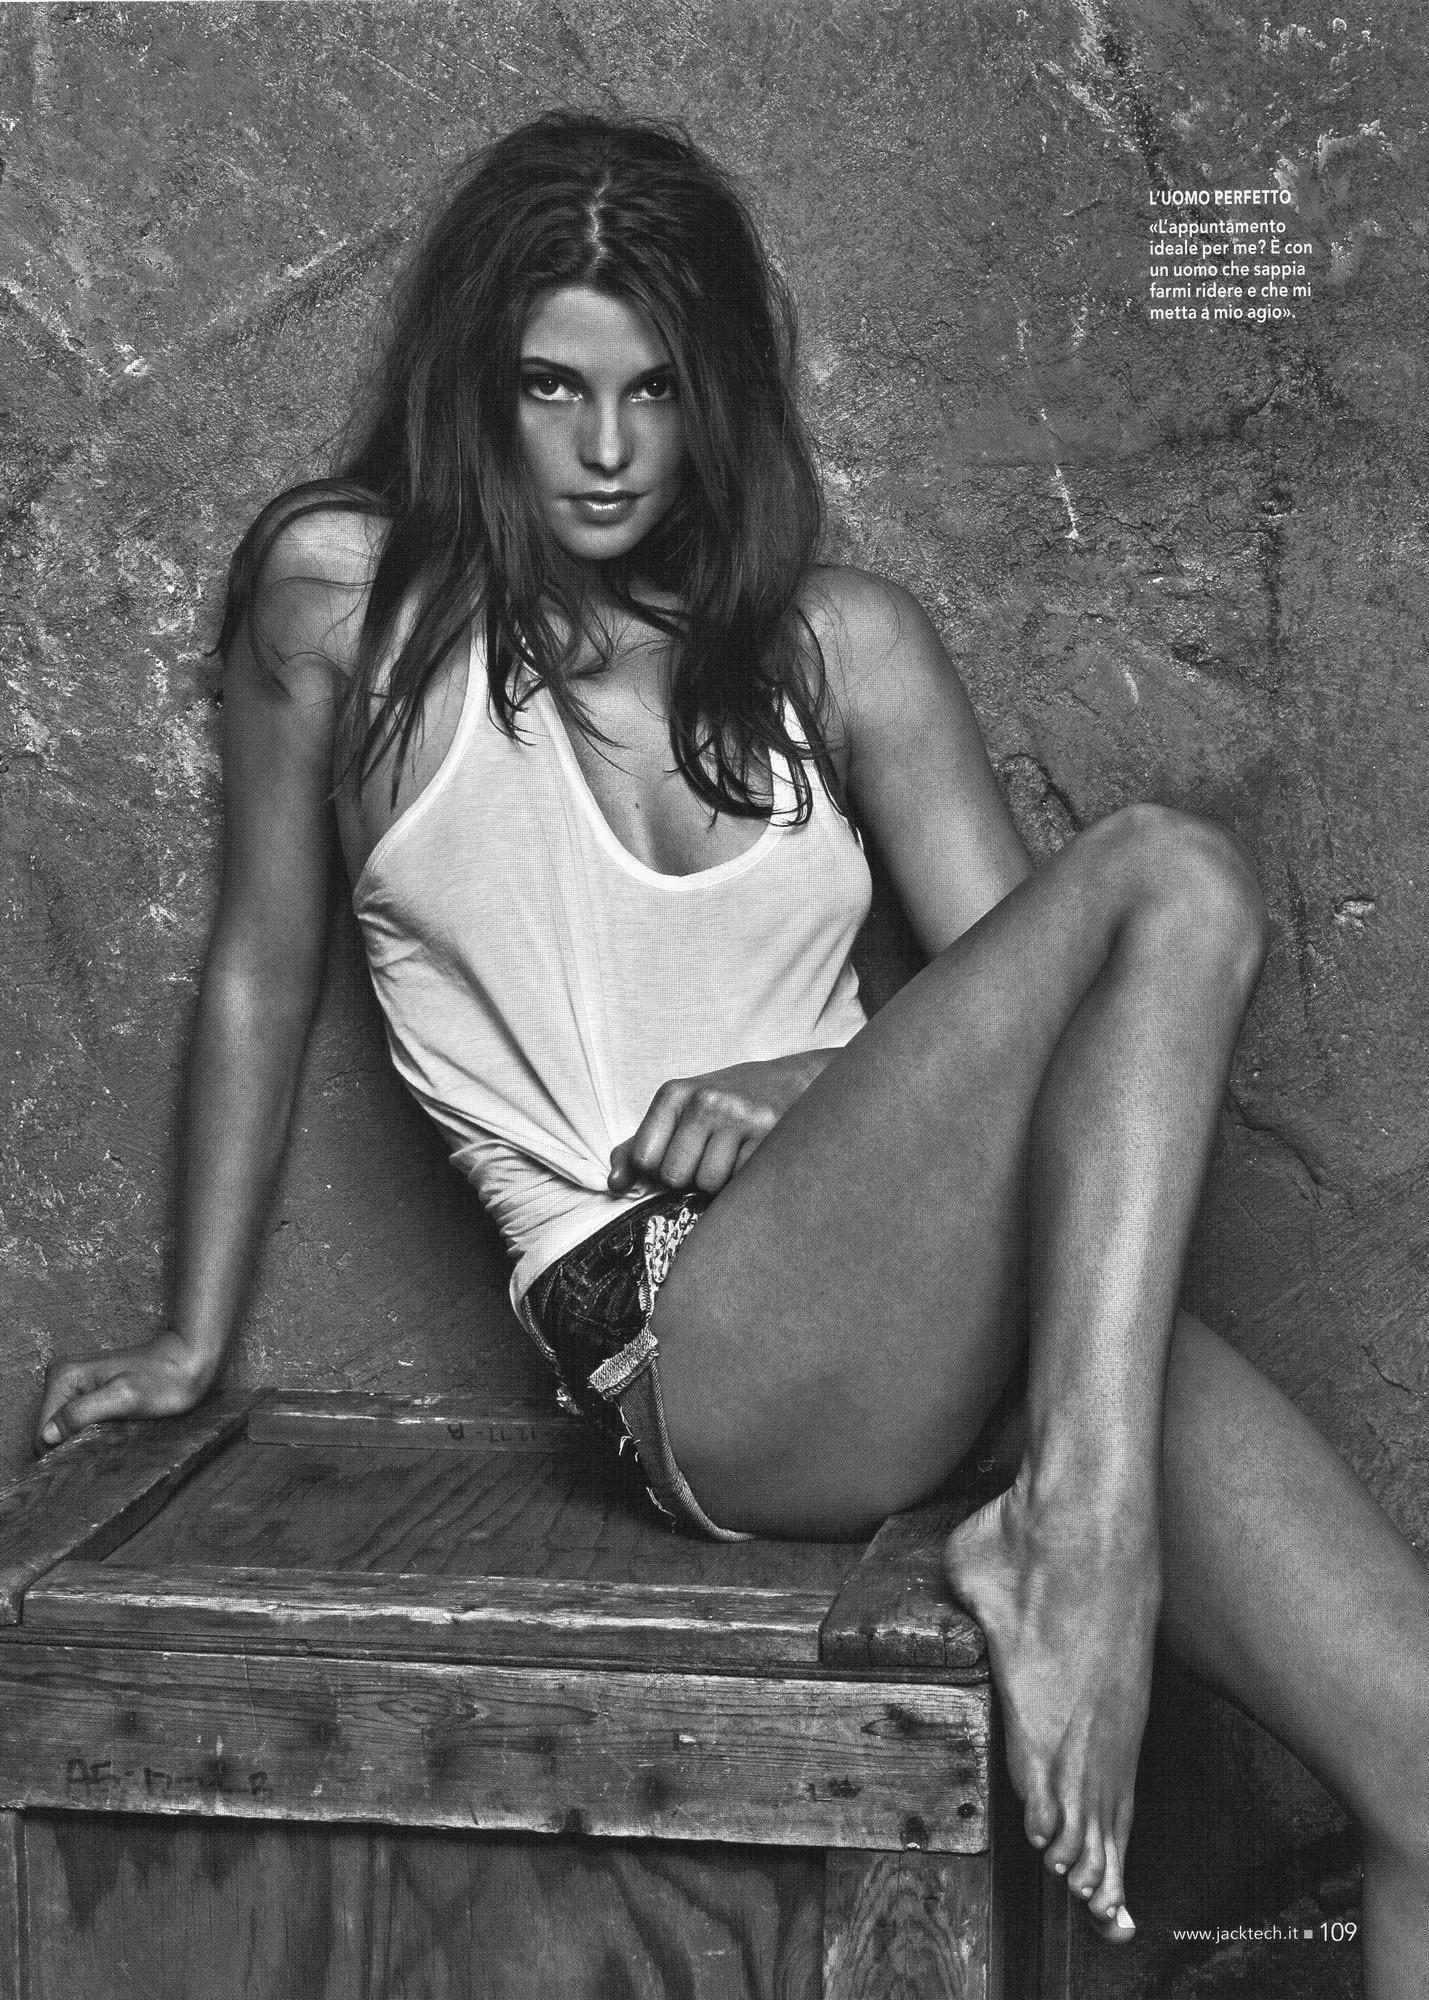 Boobs Christine Sofie Johansen nude (25 photos), Ass, Leaked, Twitter, panties 2006